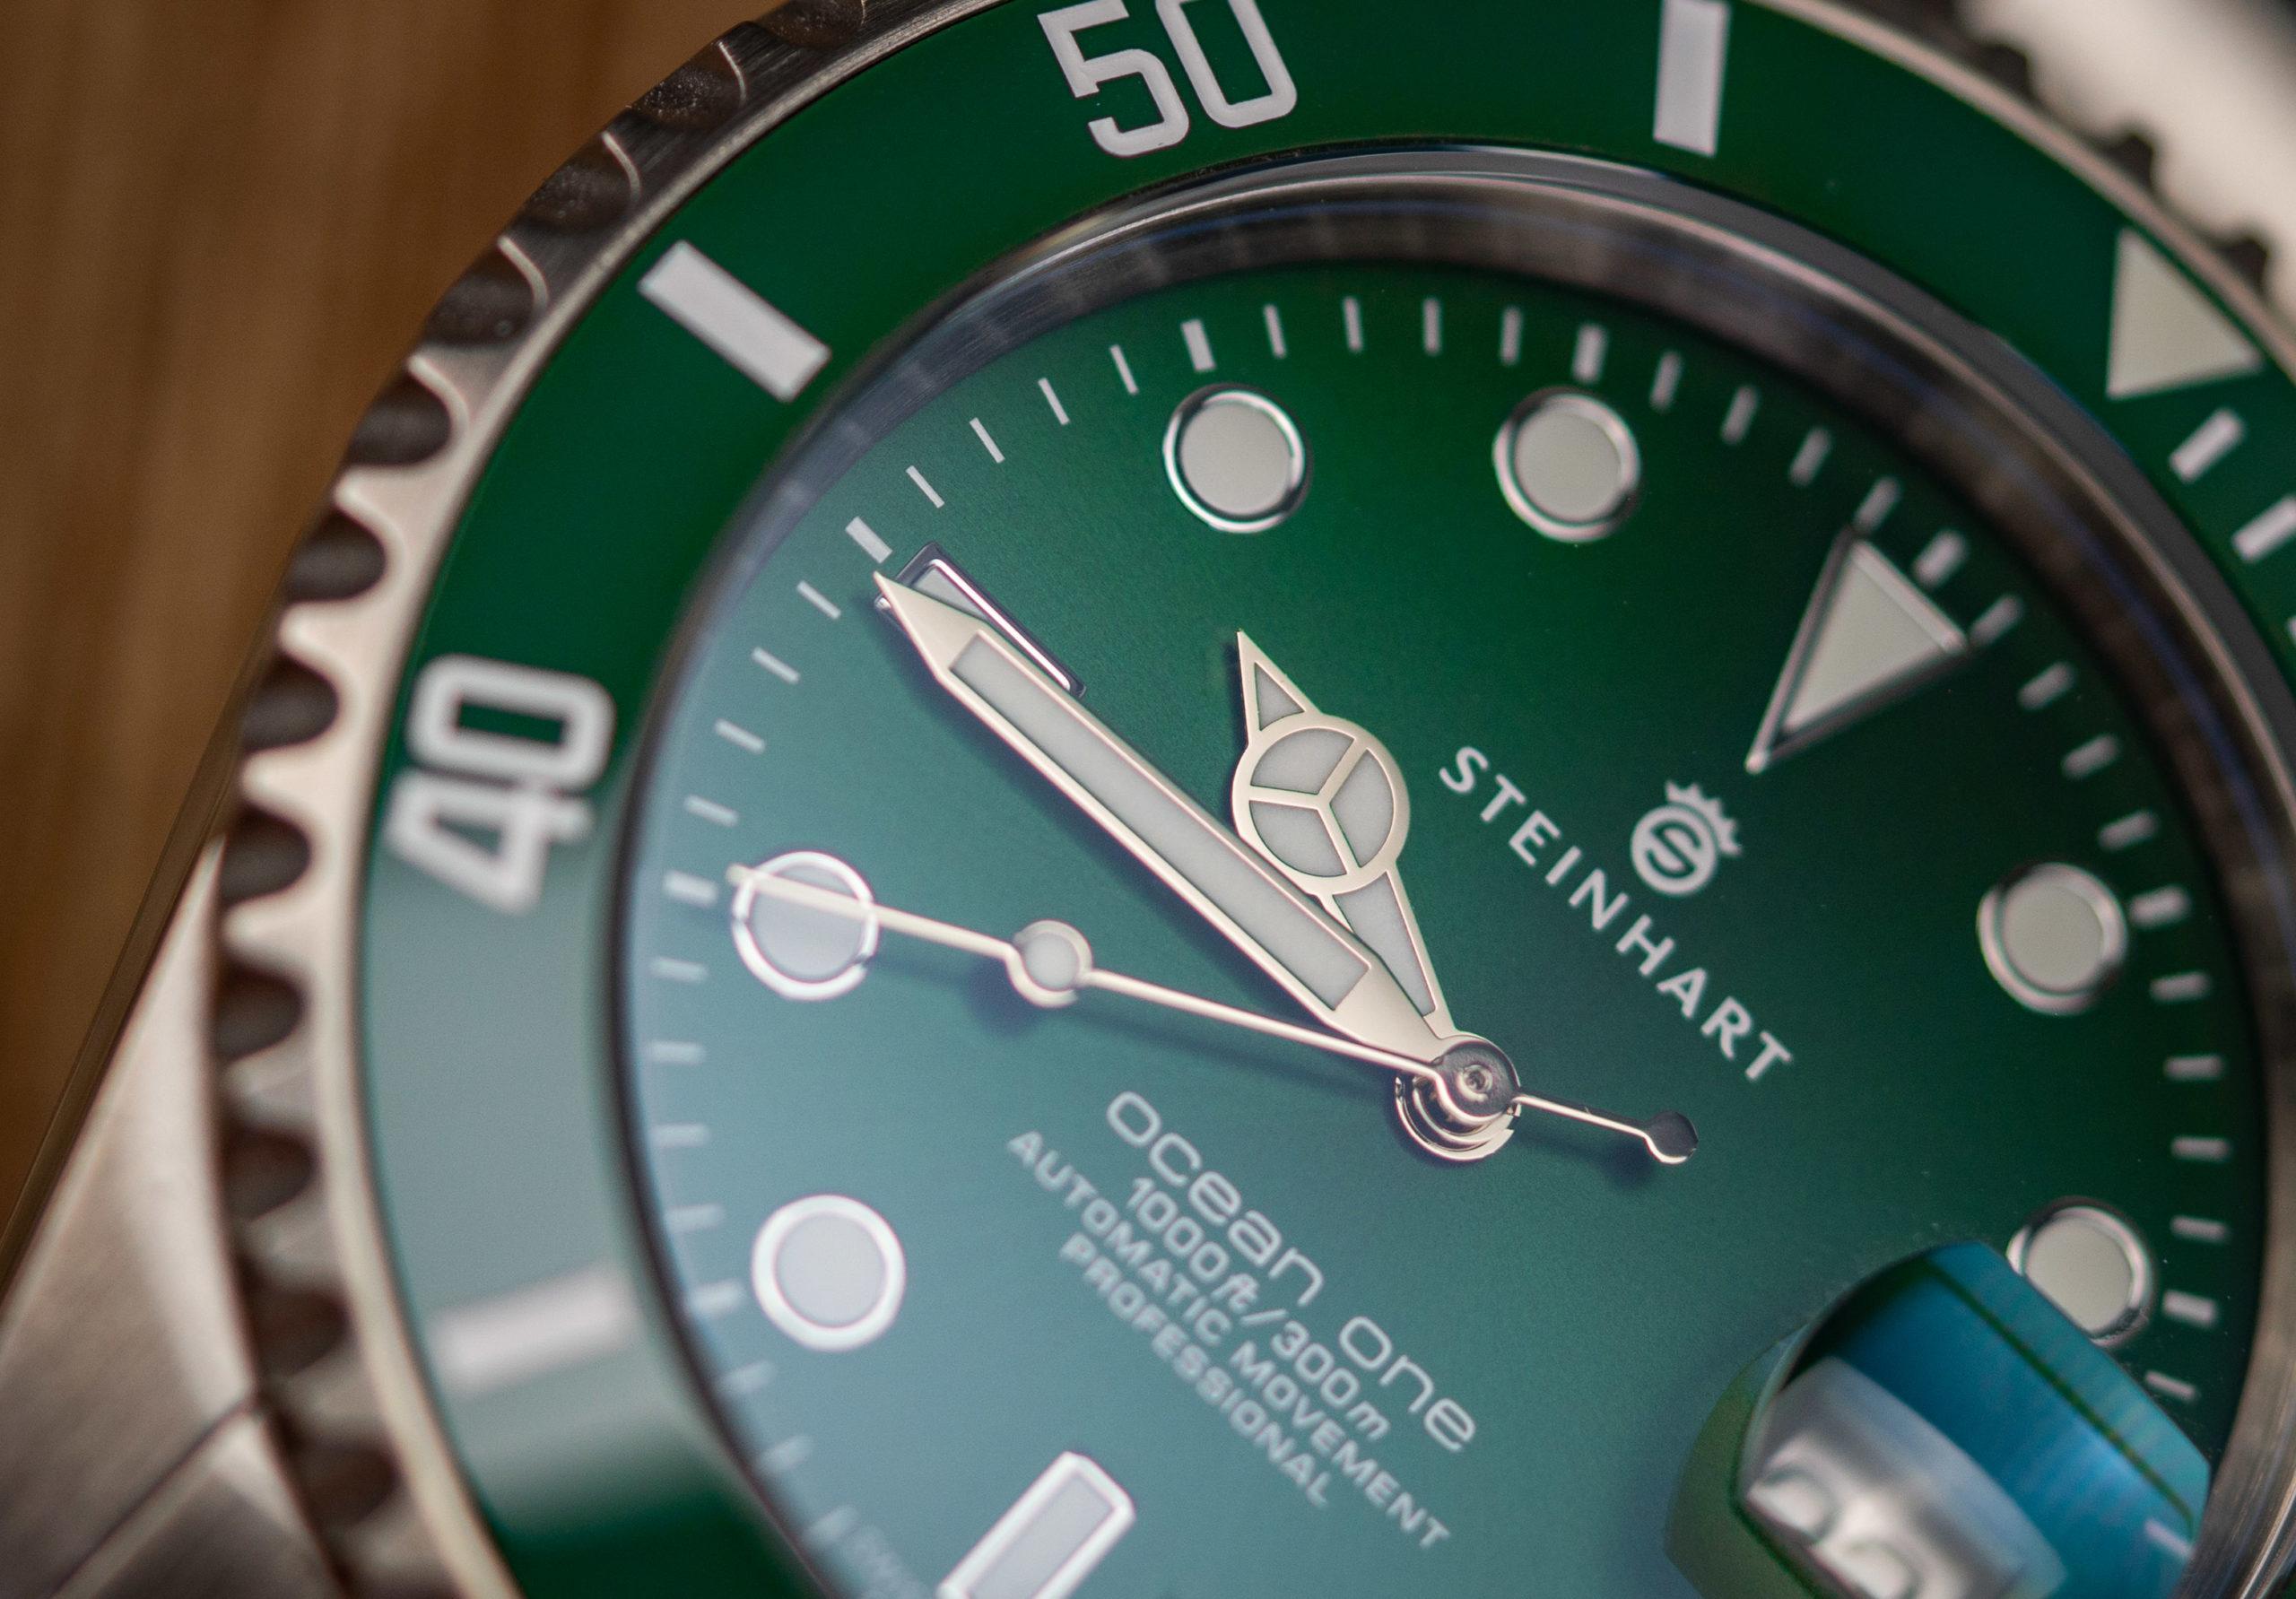 Steinhart-Ocean-One-Double-Green-Keramik-Test-Uhr